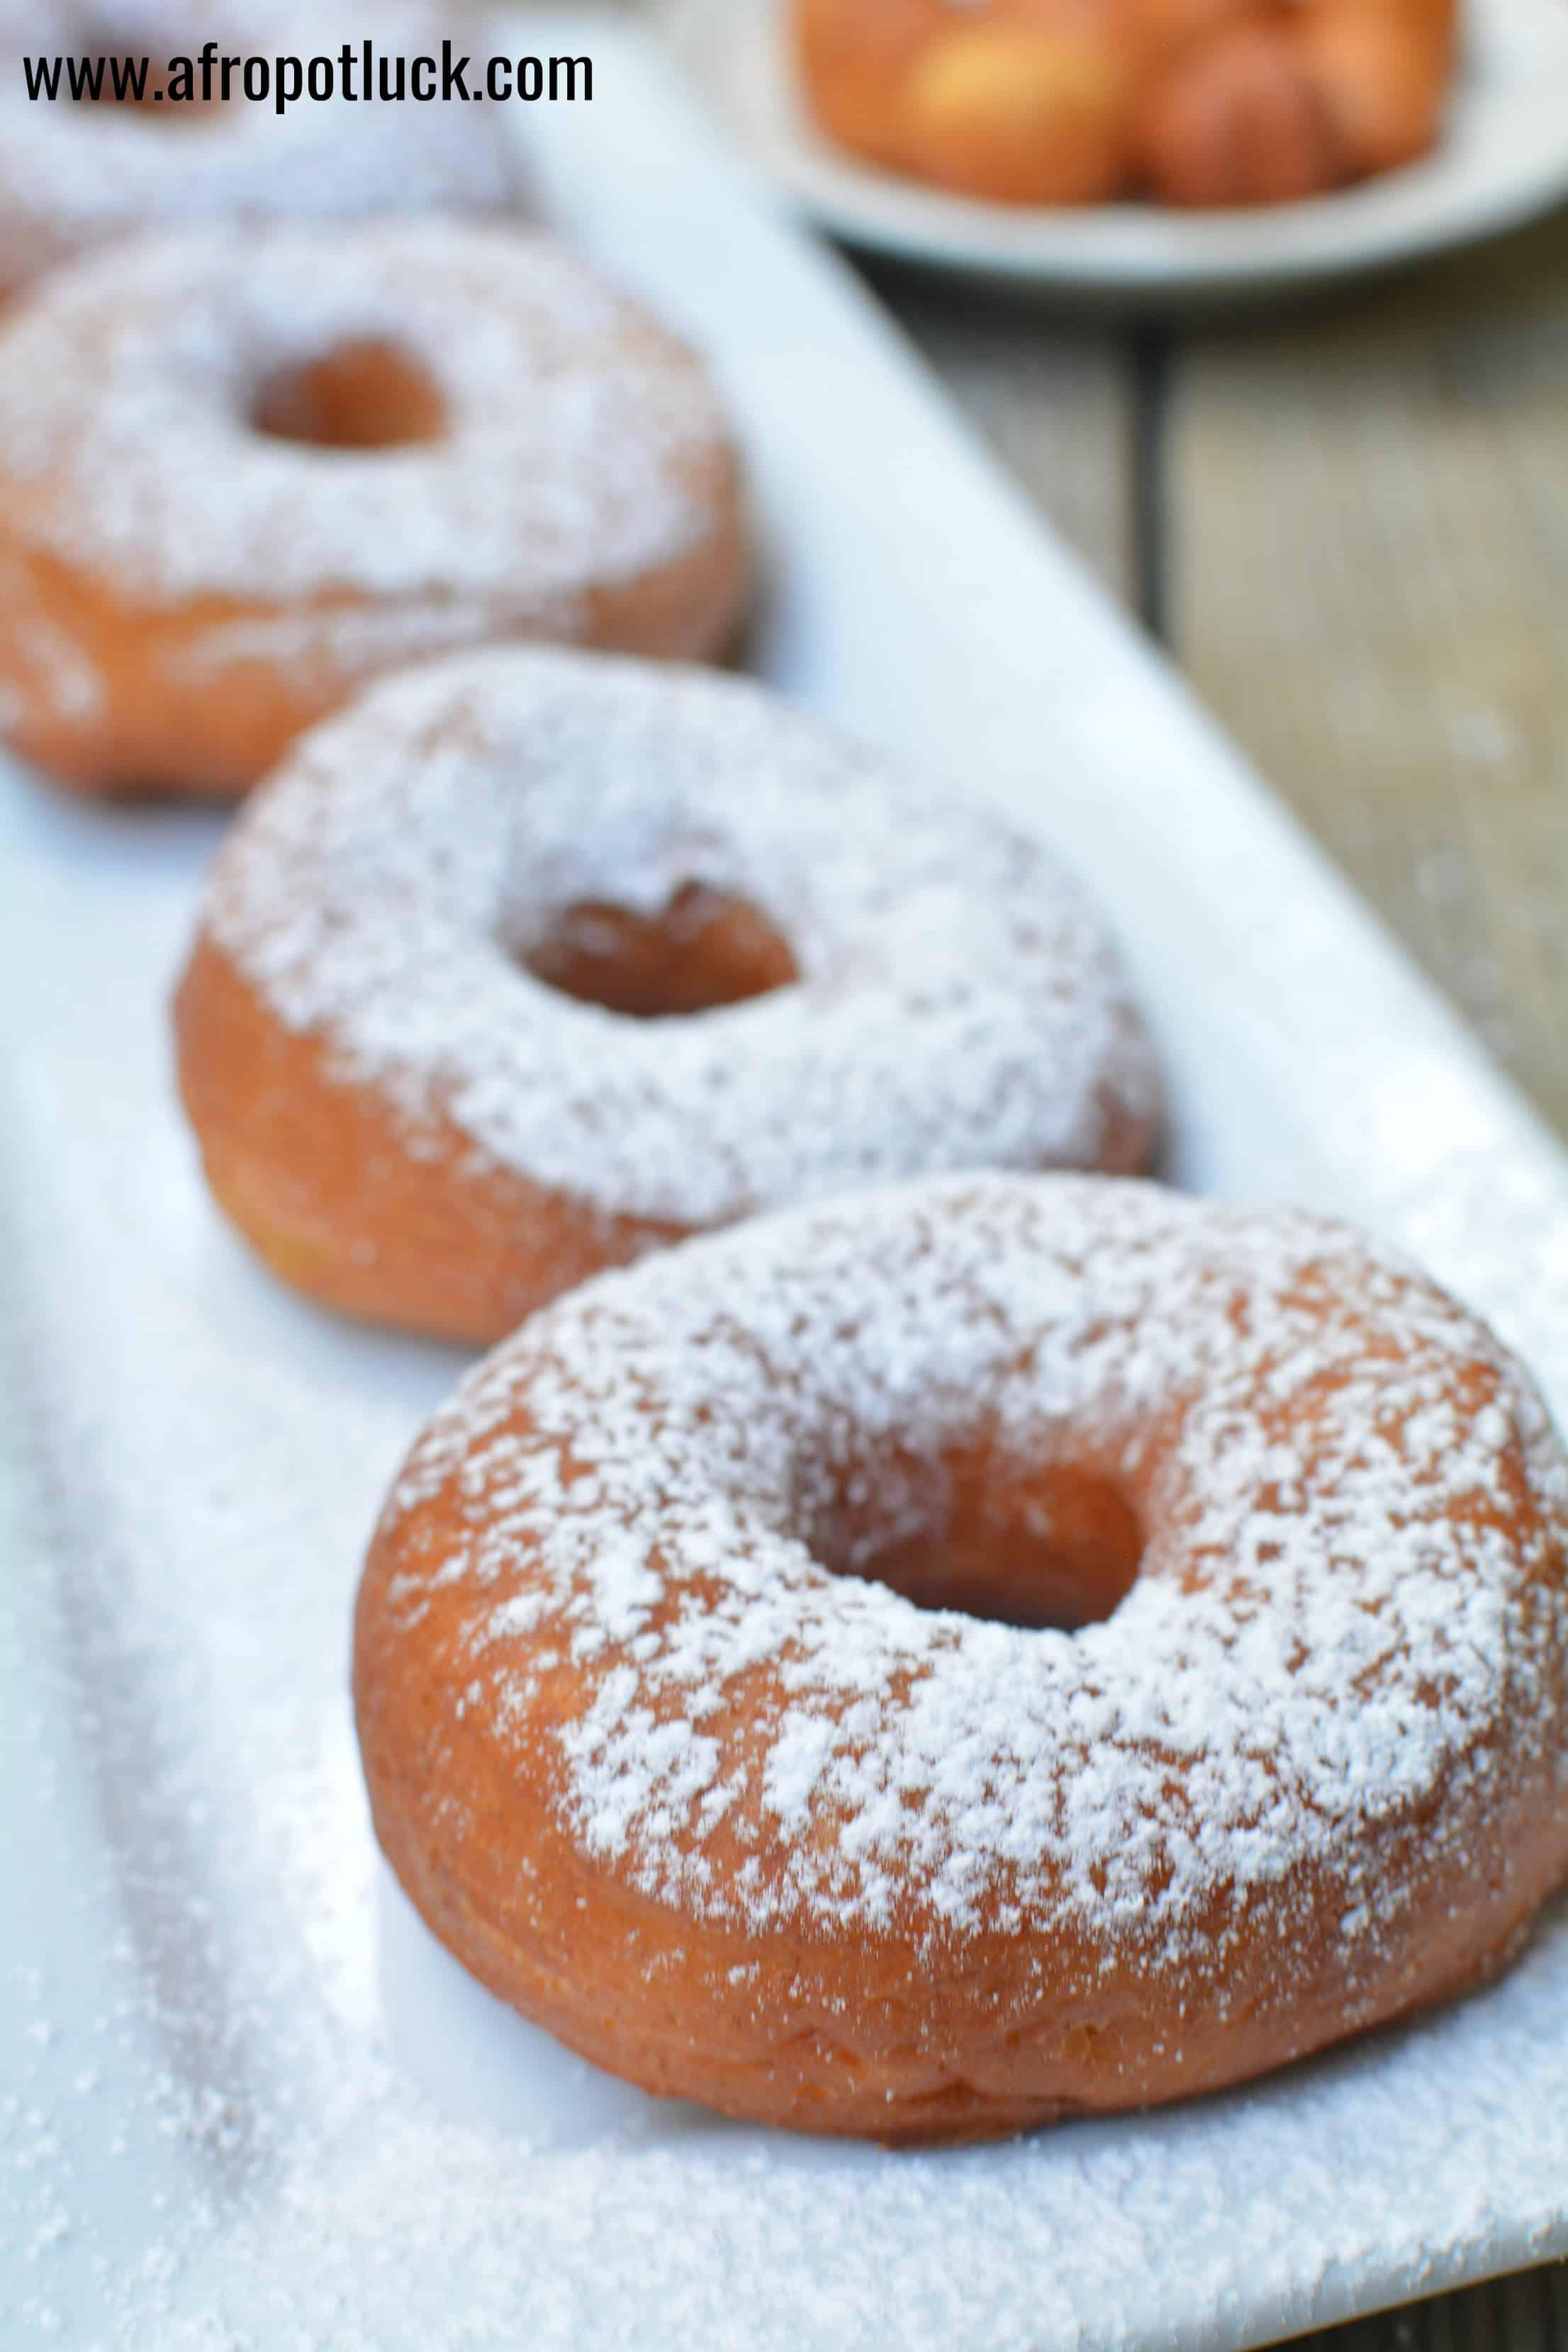 Easy Yeast Raised Donuts - Chef Lola's